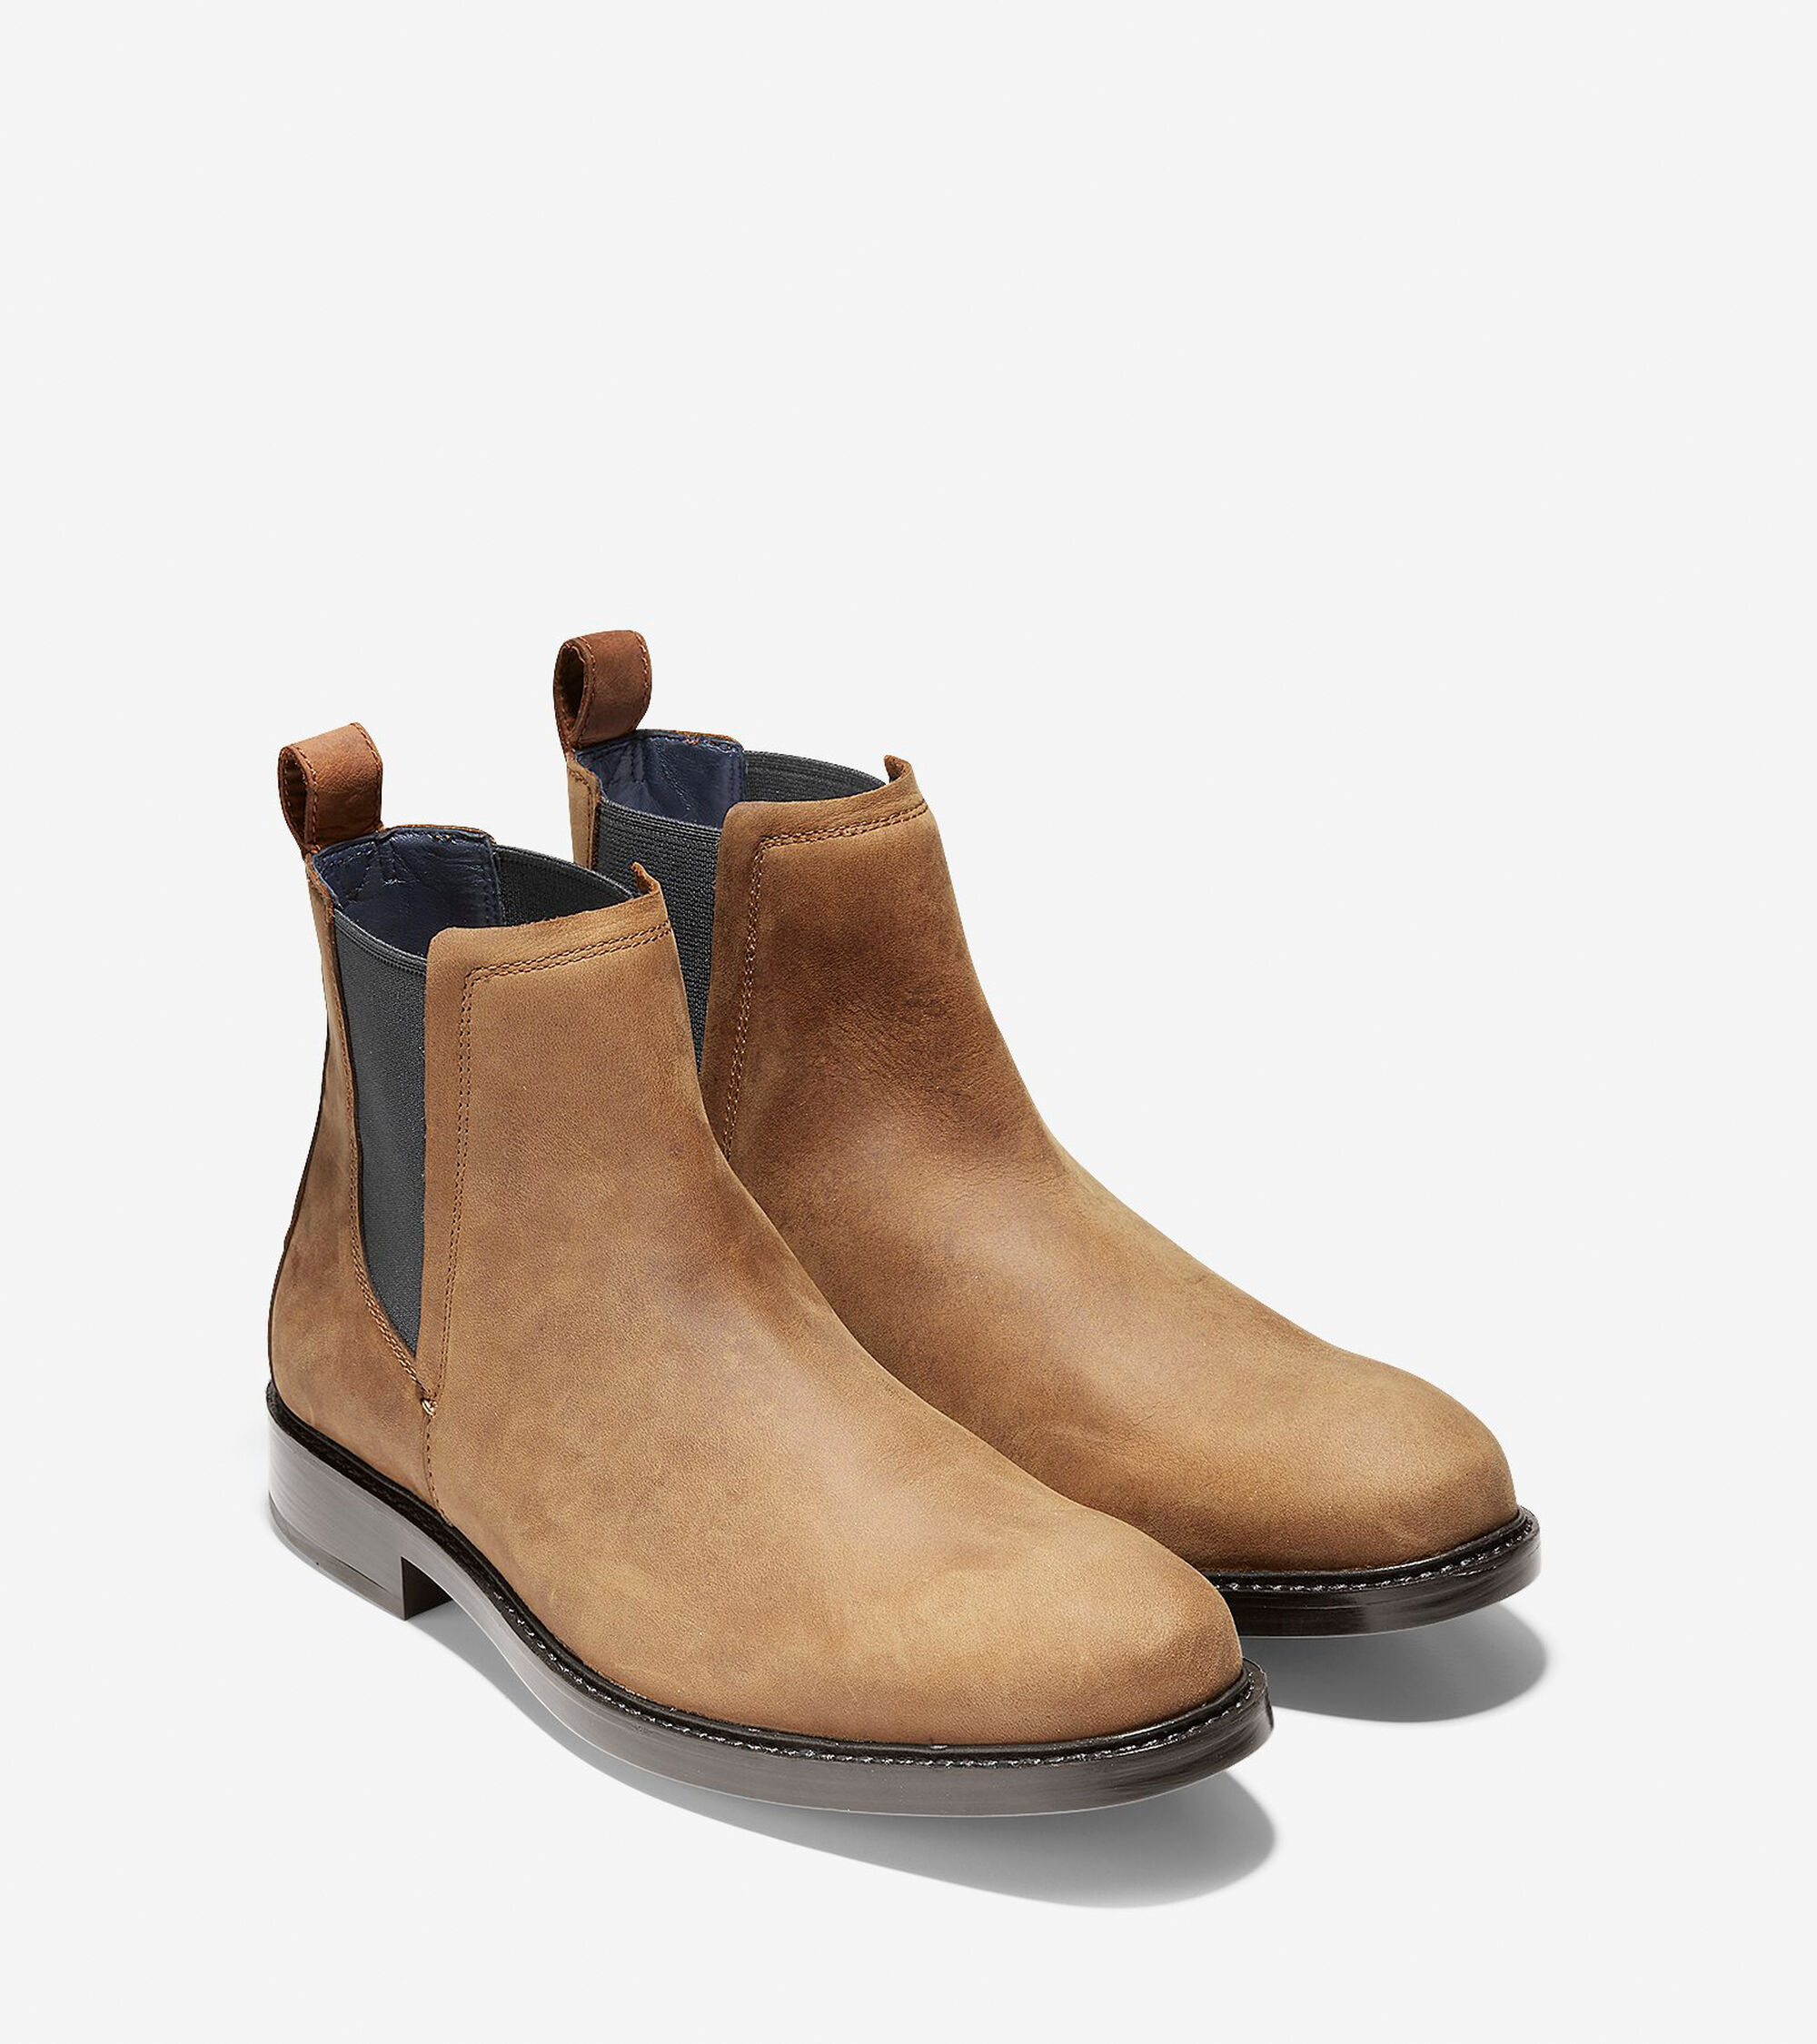 54ff6a97dbf Men's Kennedy Grand Waterproof Chelsea Boots in Dogwood   Cole Haan